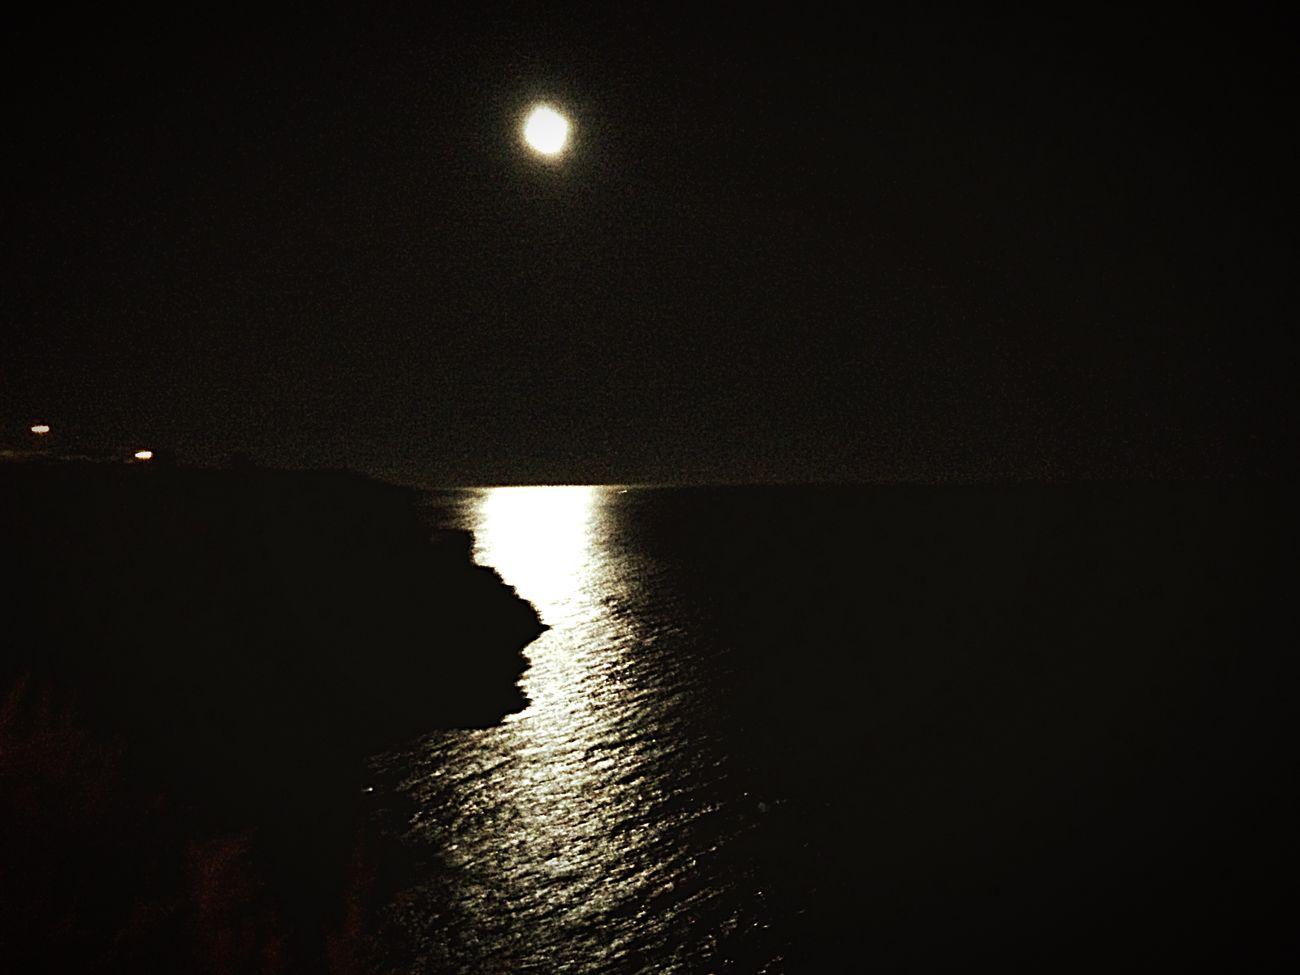 Noitedeluar Humility Portugal Algarve Carvoeiro Amor ♥ Noiteboa Beauty In Nature Vacations No People SEJA HUMILDE Bob Marley Seja humilde, pois, até o sol com toda sua grandeza se põe e deixa a lua brilhar... First Eyeem Photo